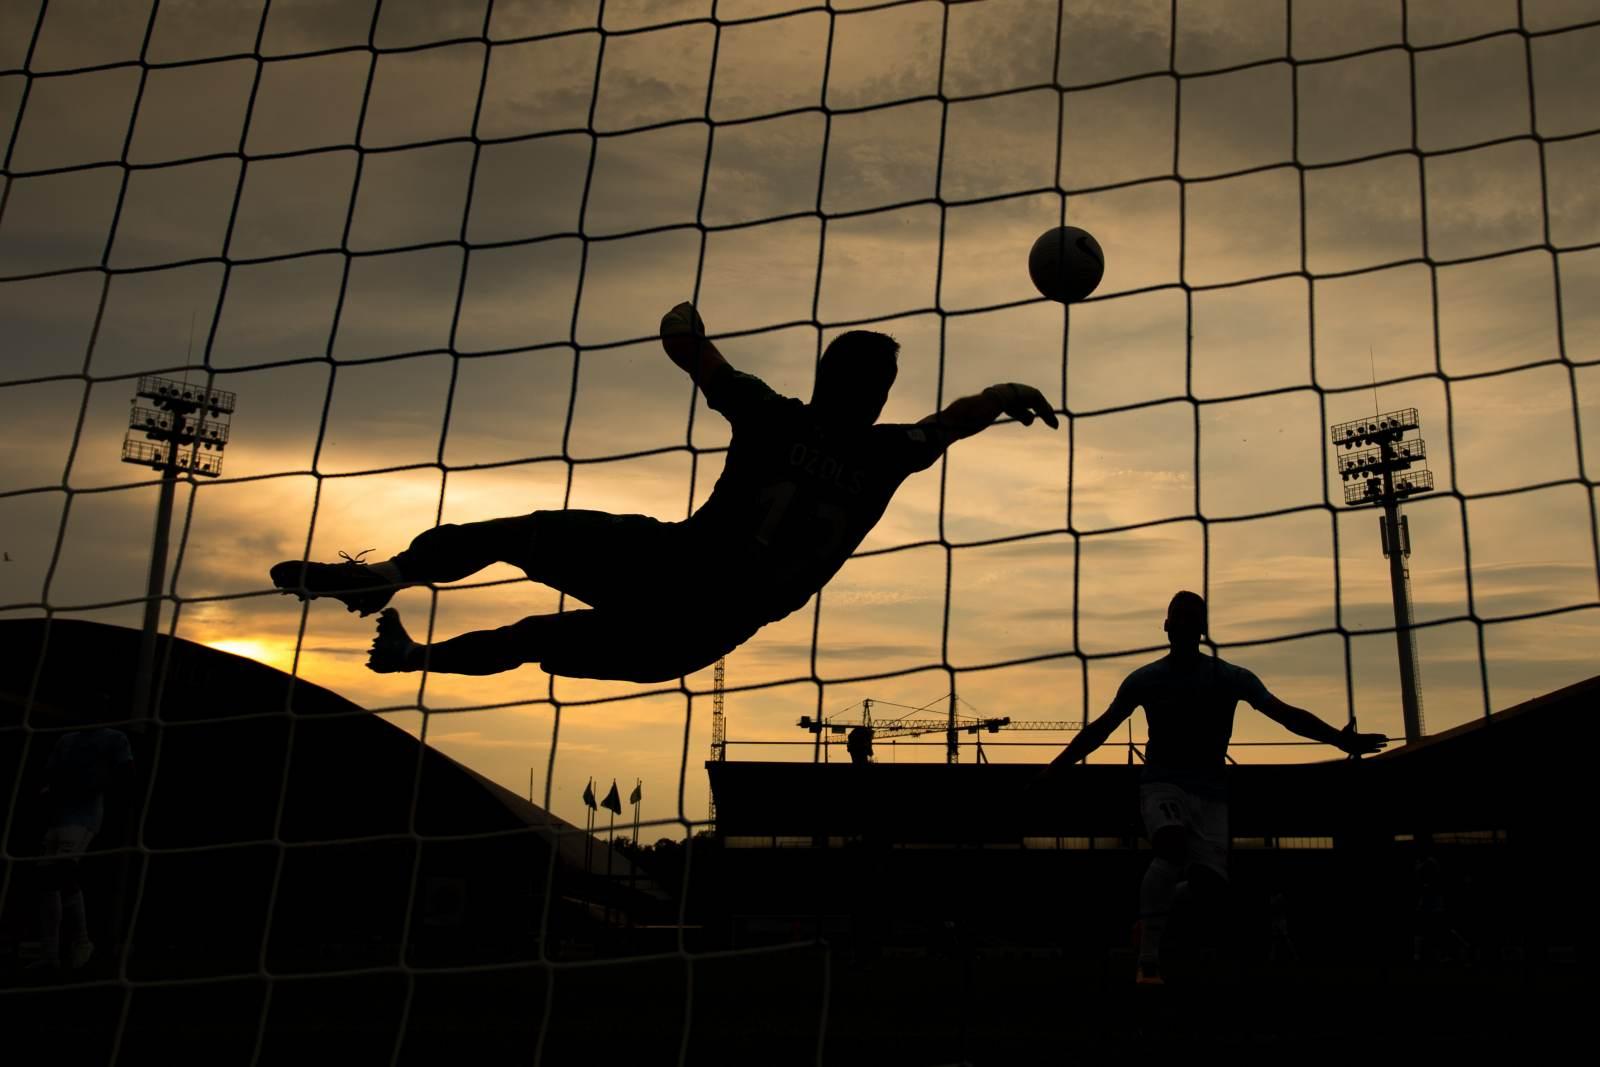 Начало матча Молдова – Австрия задерживается из-за квадрокоптера